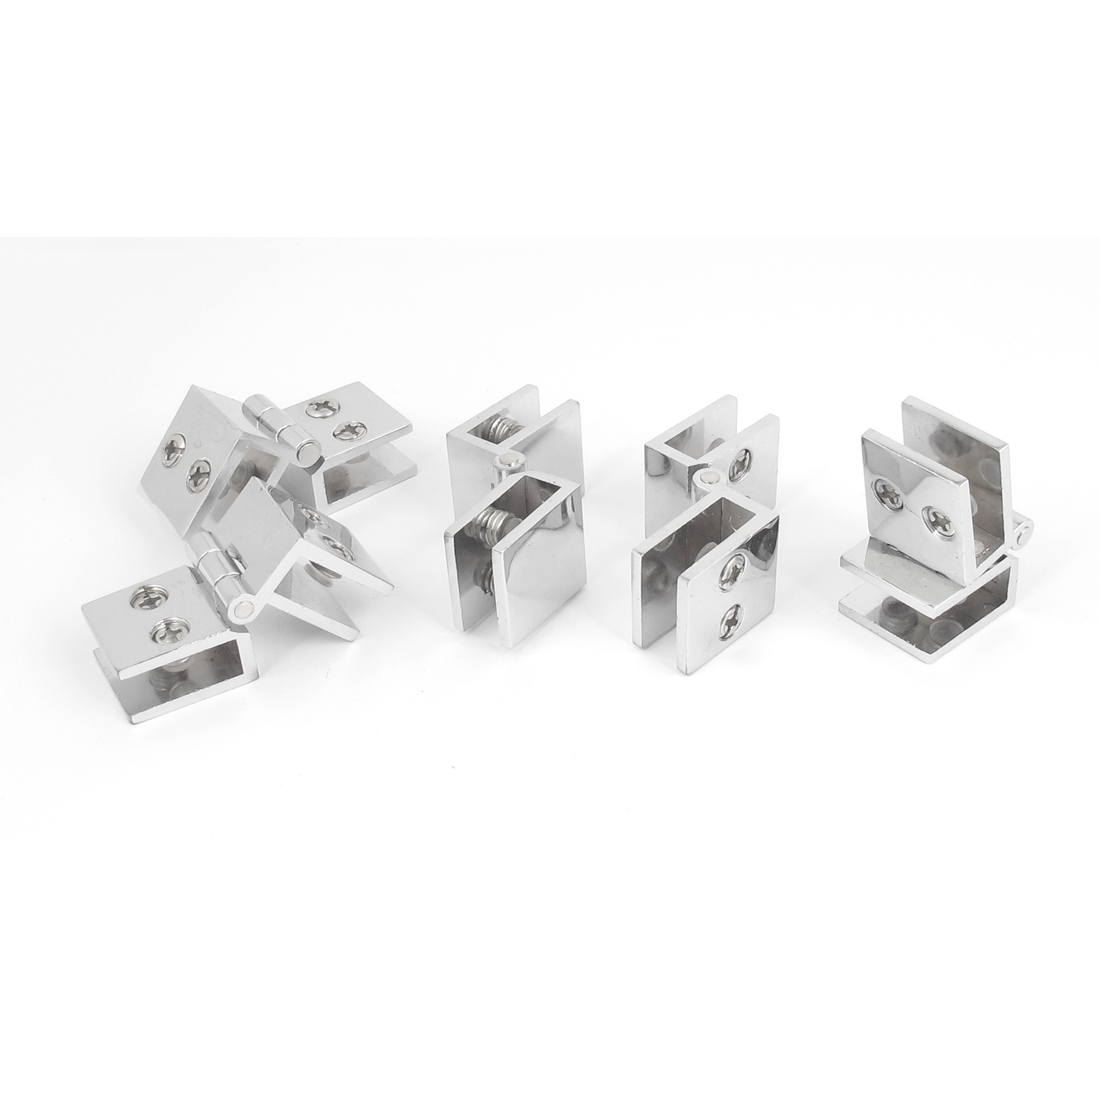 Bathroom Shower 5mm-8mm Adjustable Collapsible Rectangle Clamp Clip Door Hinge 5pcs